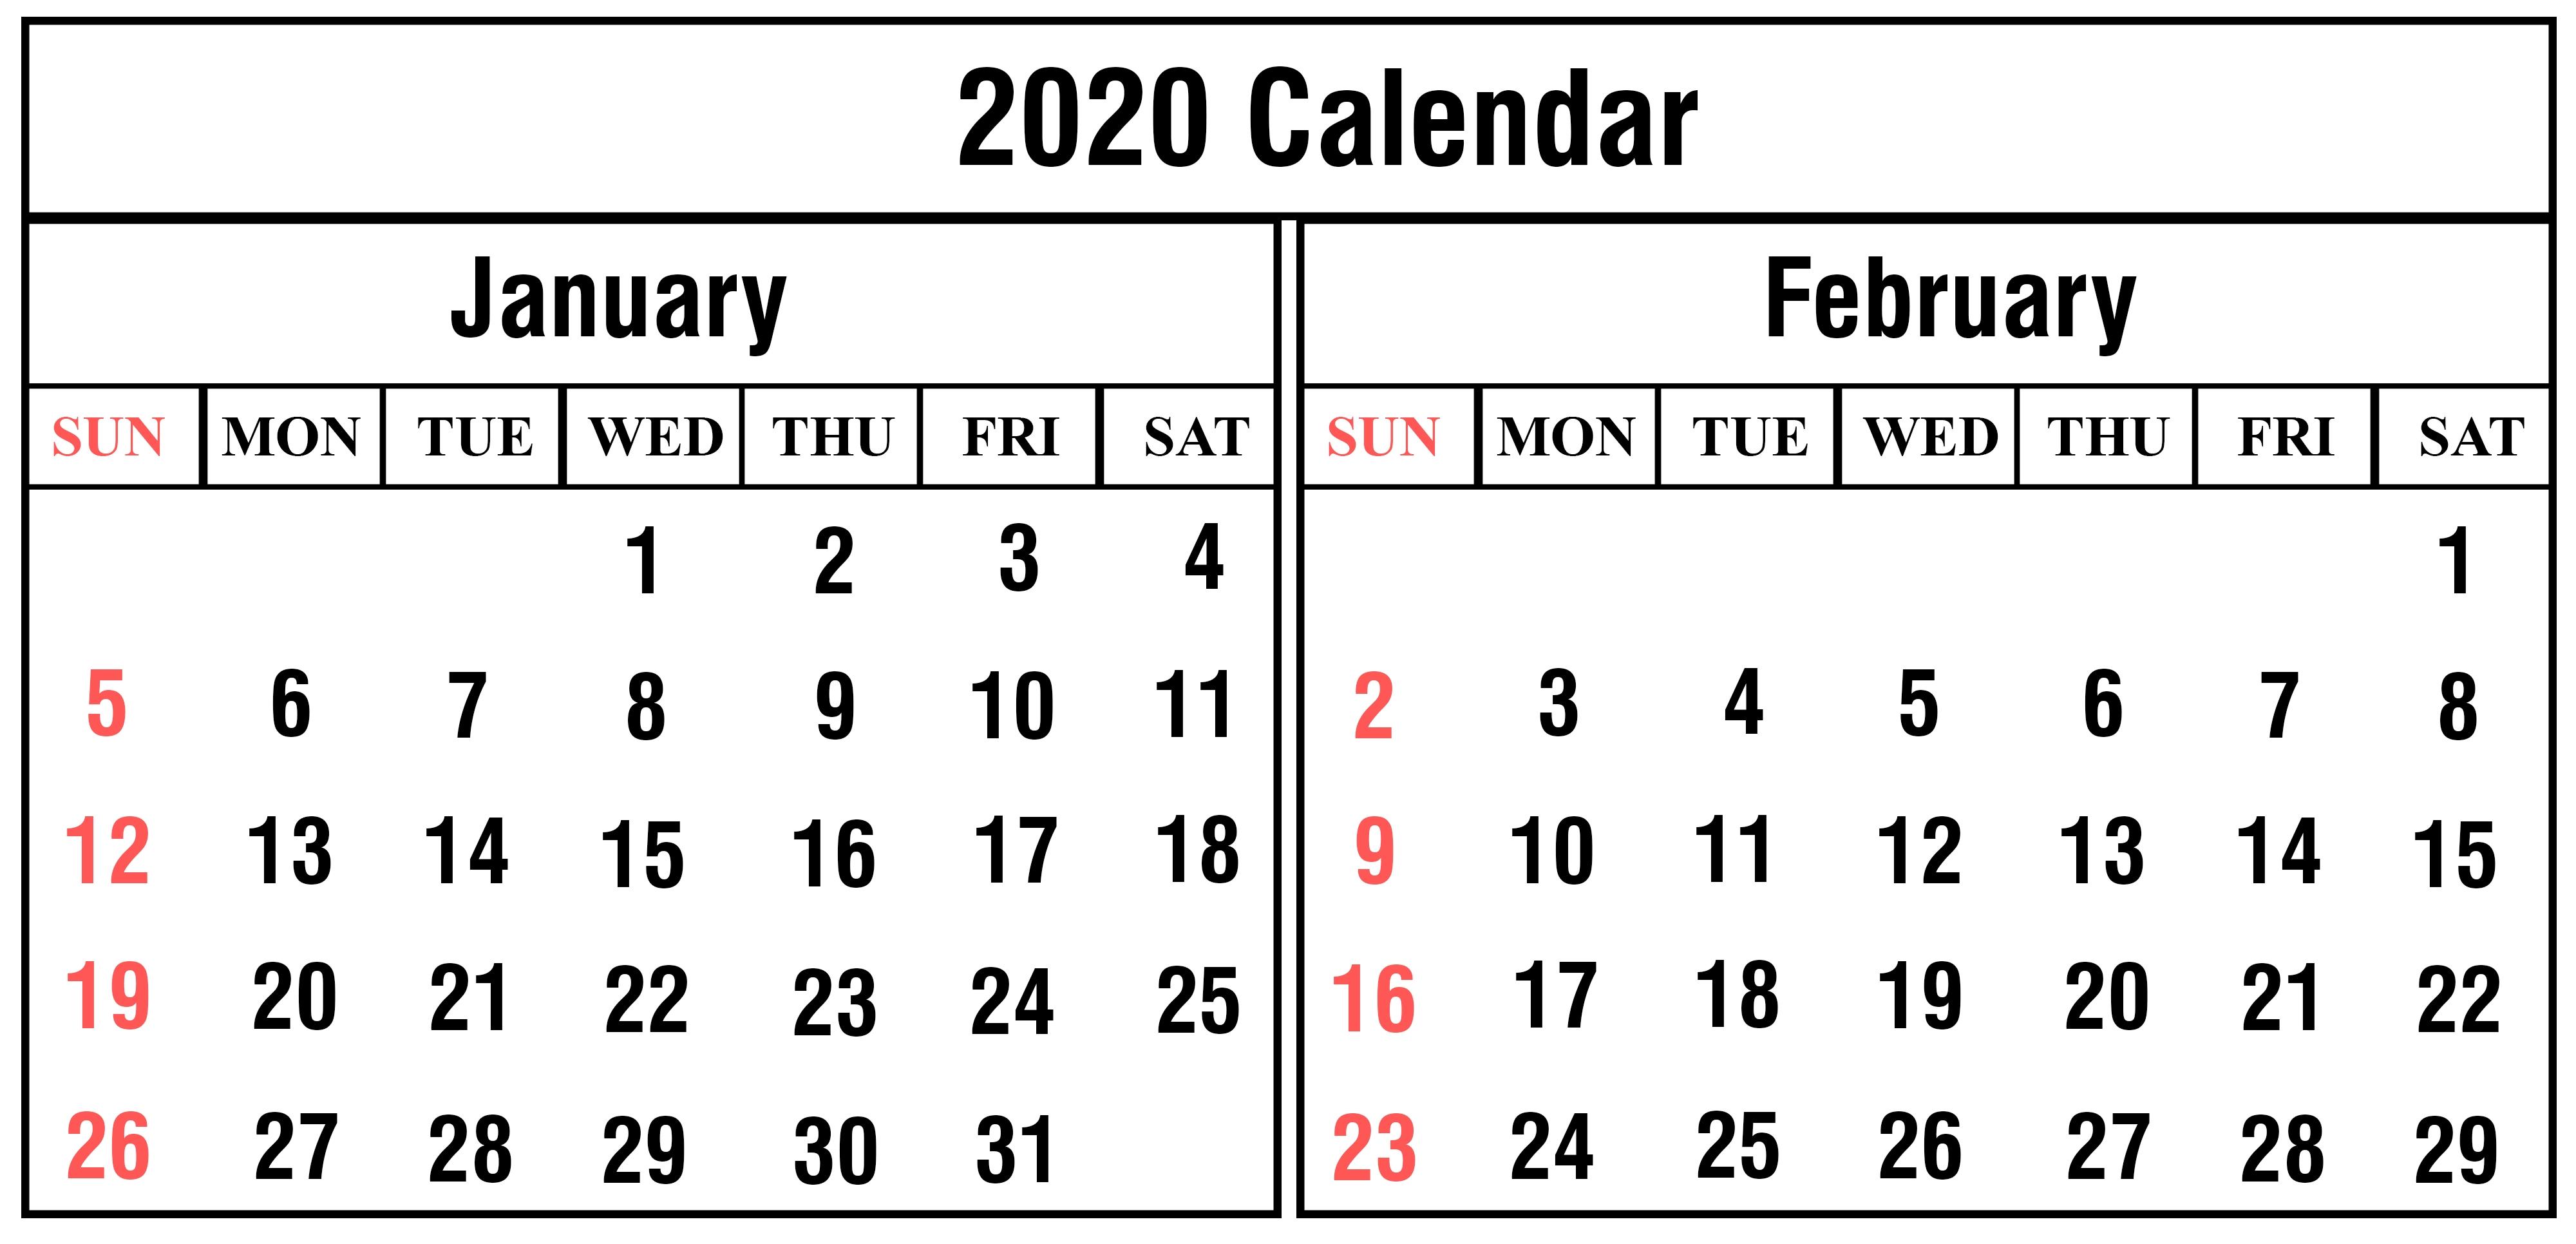 Free January And February 2020 Calendar Templates-Calendar Of January And February 2020